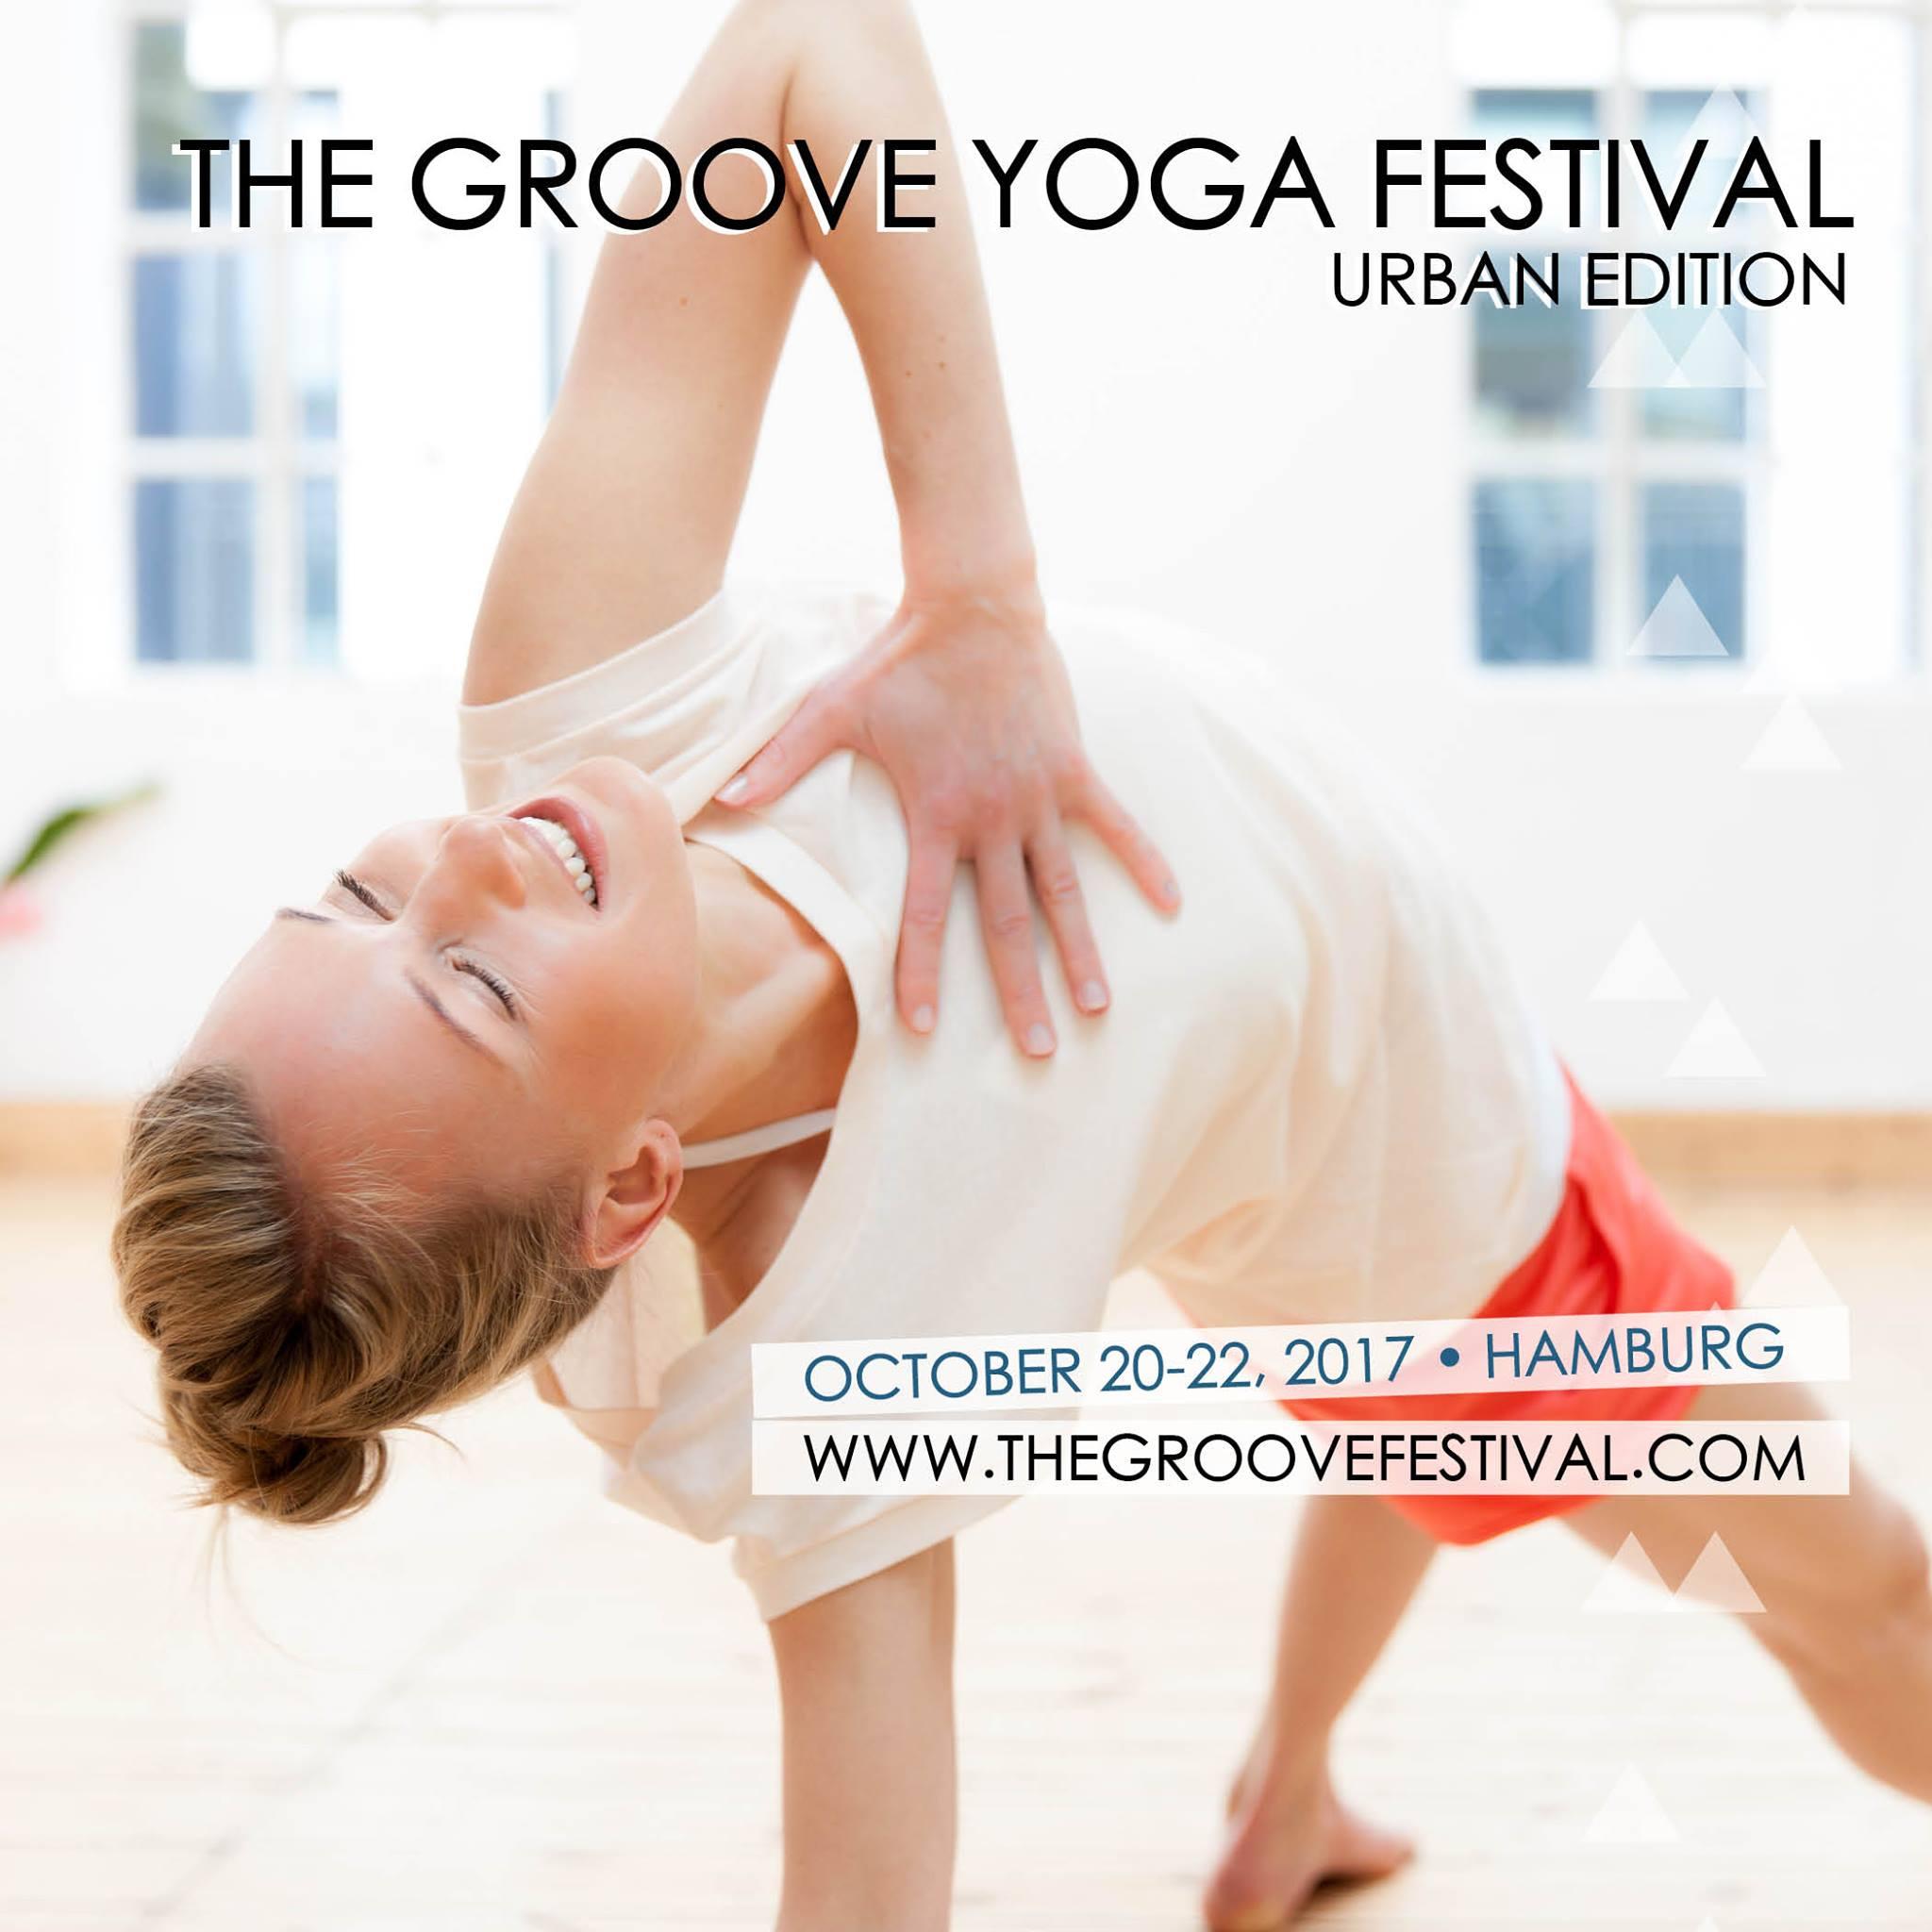 20.-22. Oktober| Groove Yoga Festival